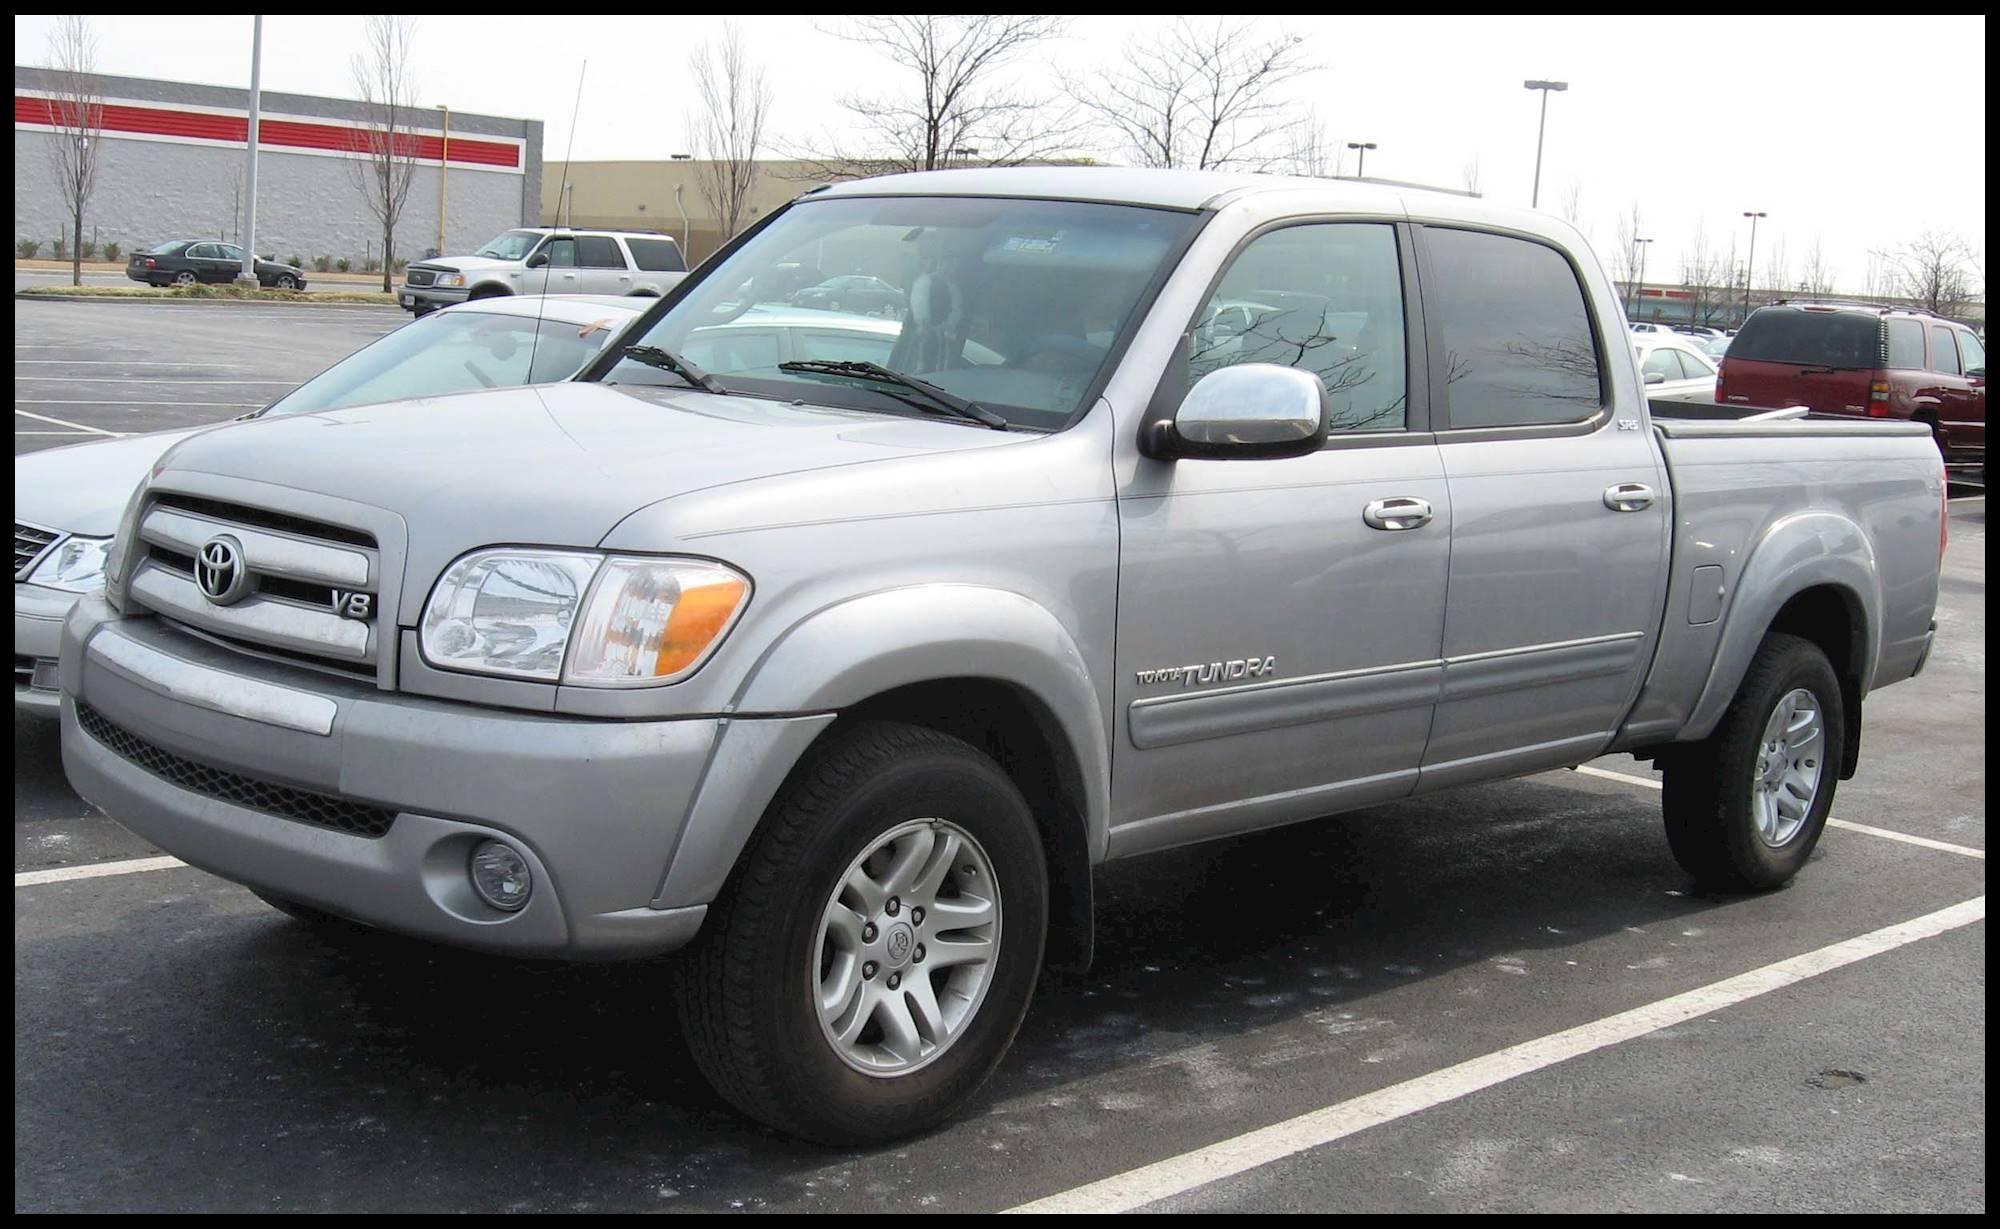 hight resolution of 2006 toyota tundra sr5 v8 4dr 4x4 access cab 5 spd auto w od